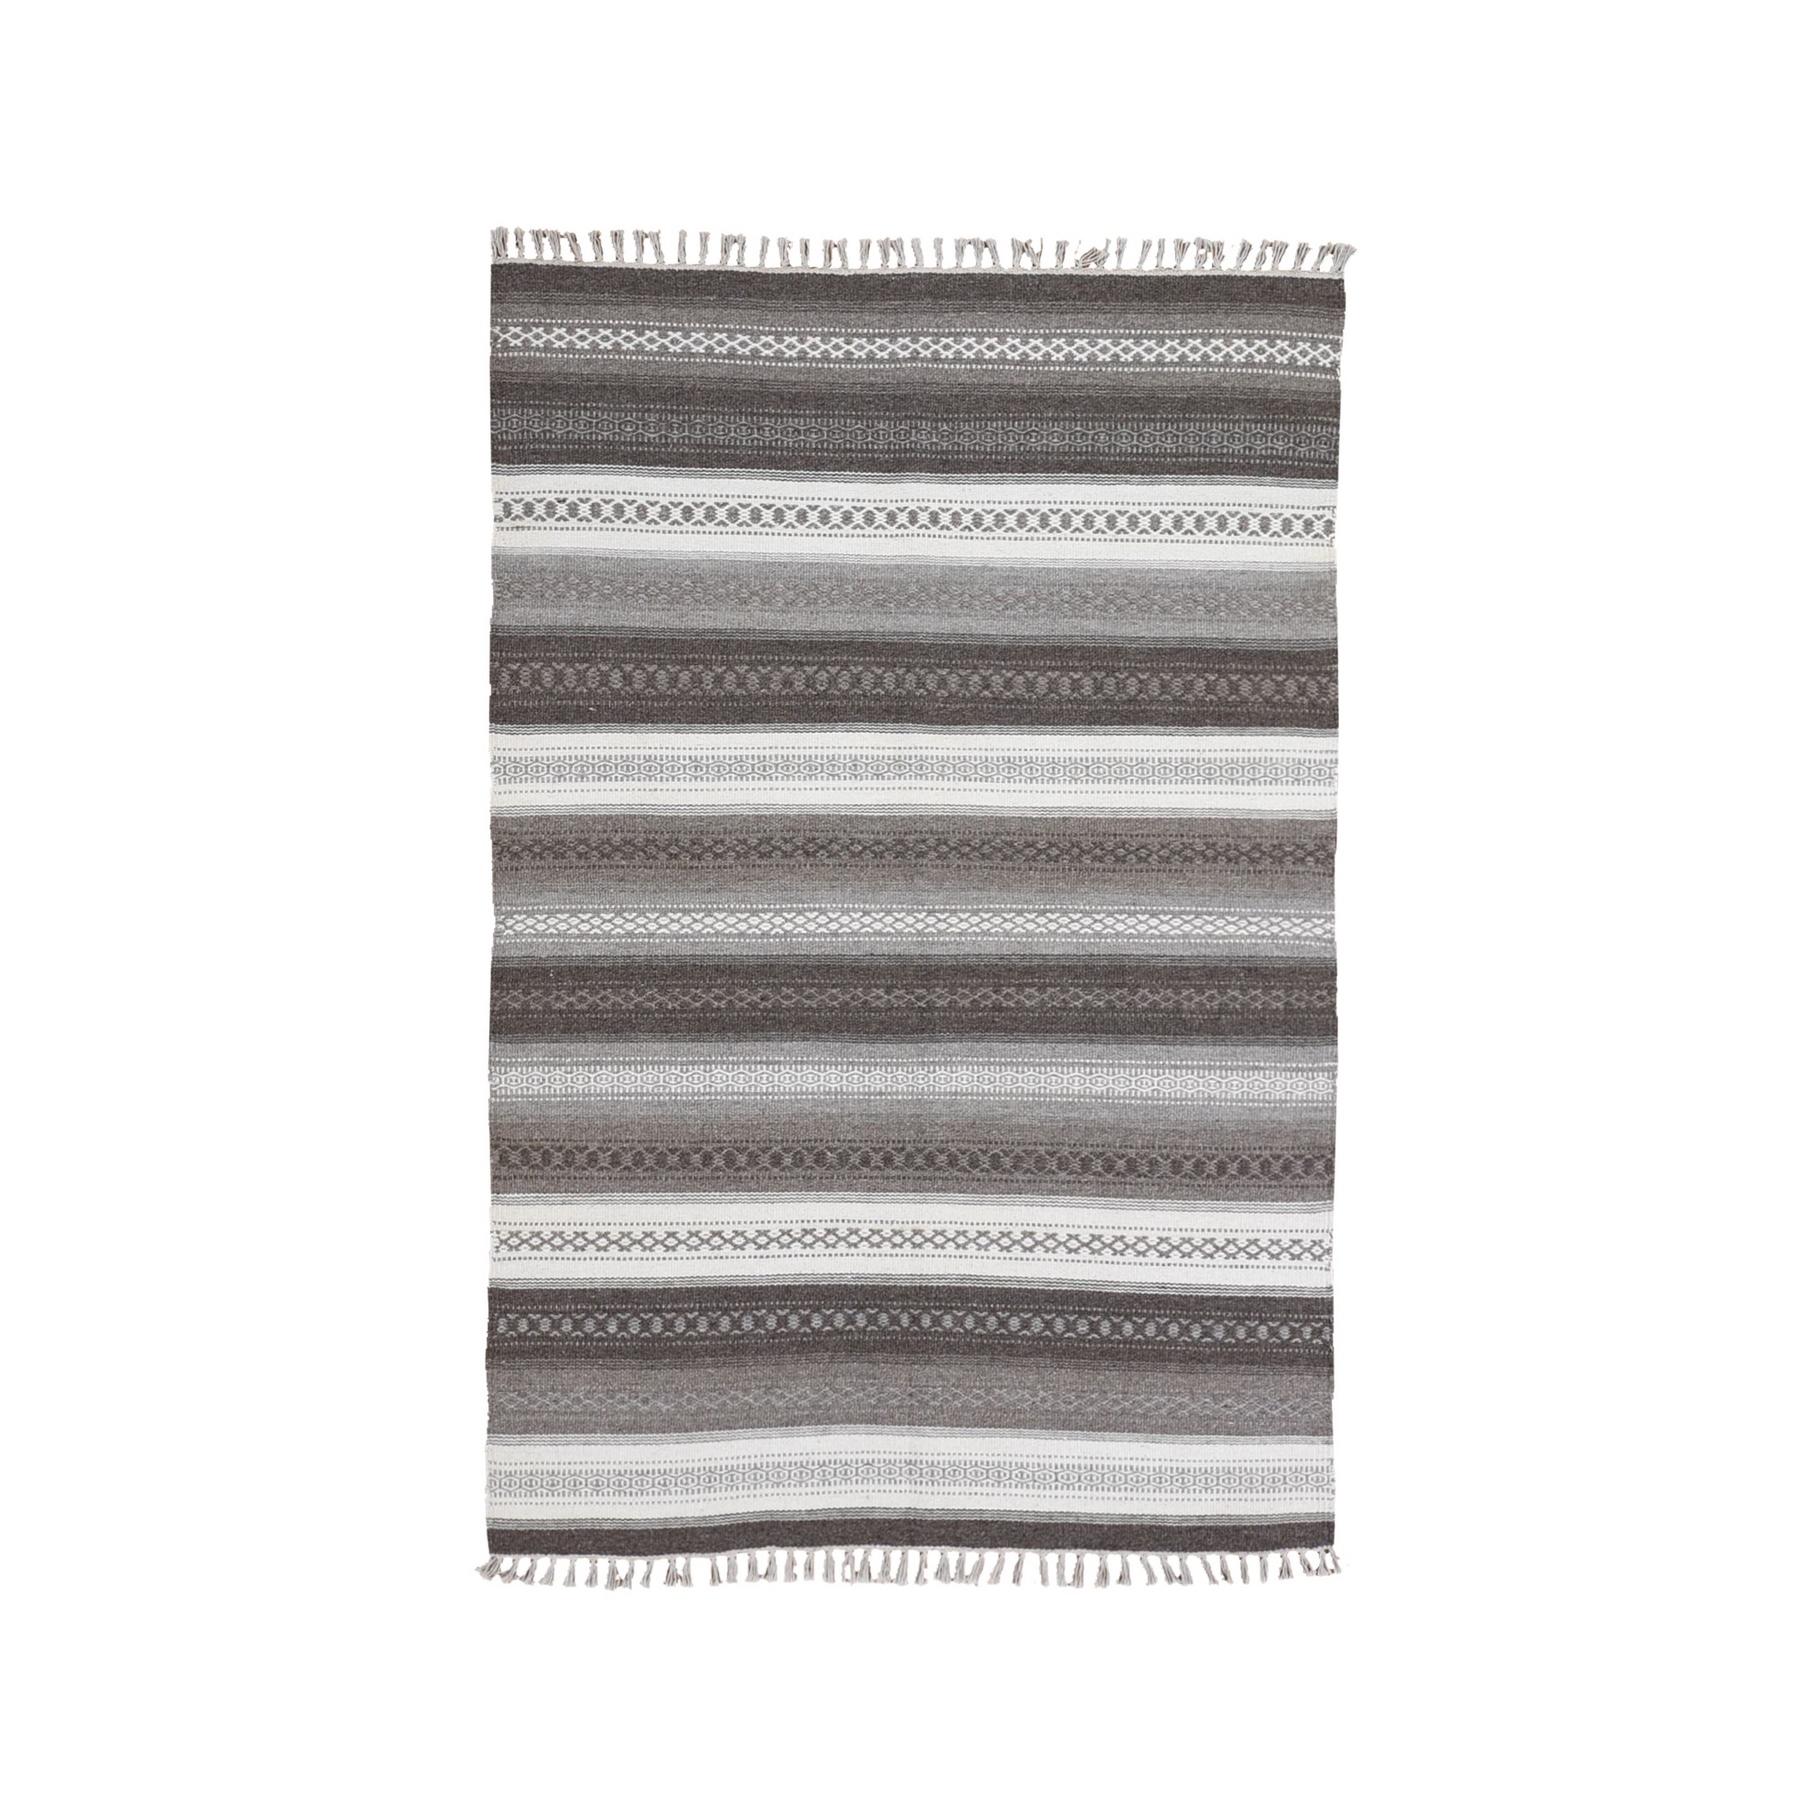 Fine Kilim Collection Hand Woven Grey Rug No: 1132146